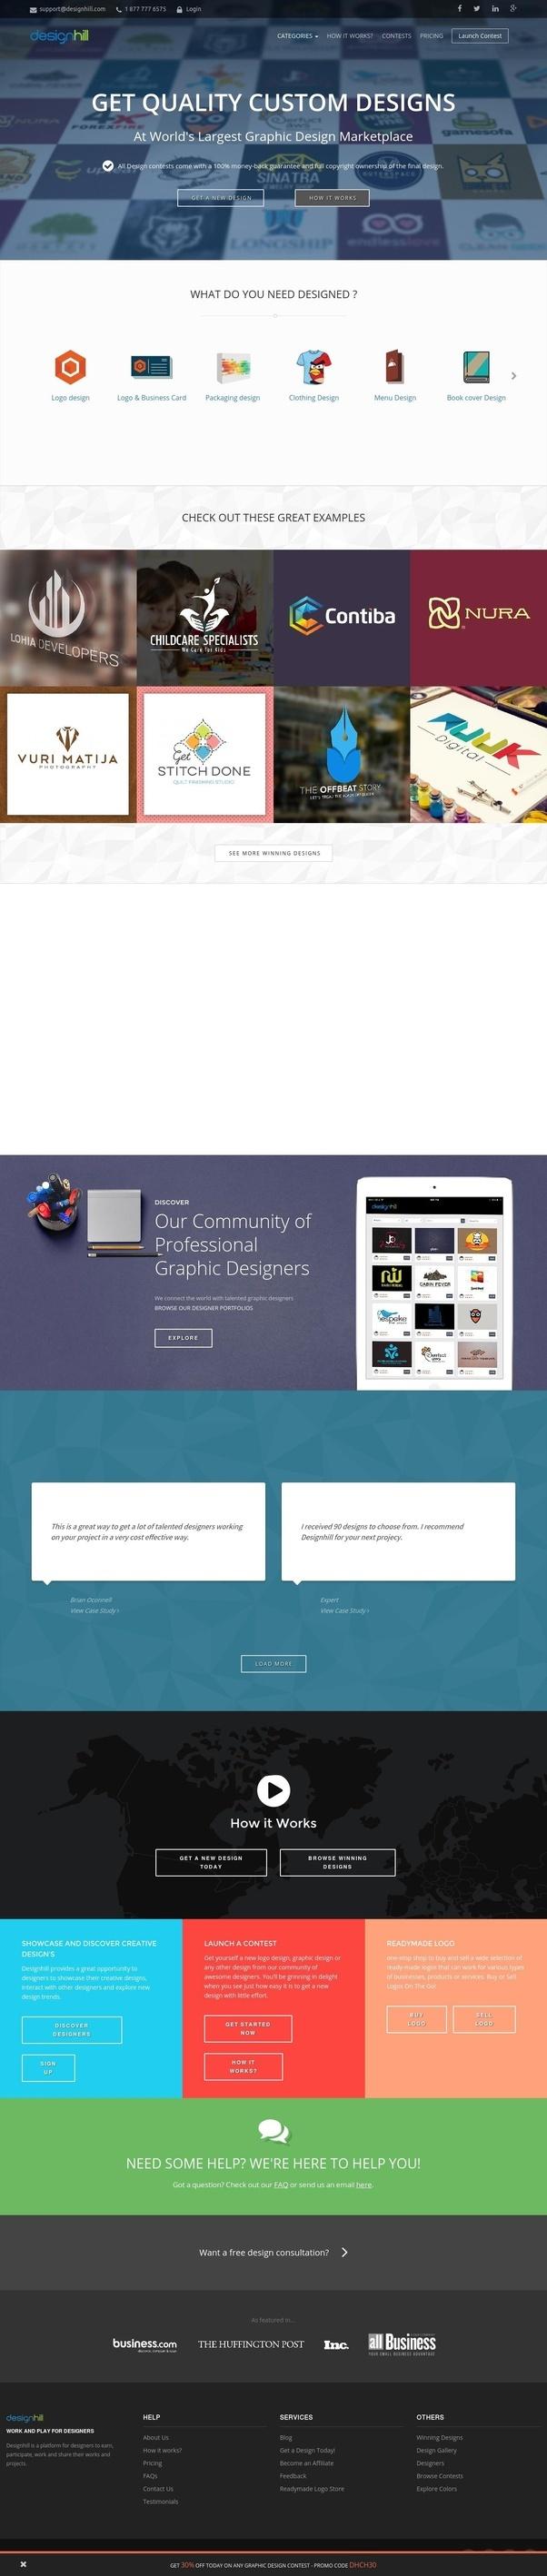 Best Place To Find Freelance Graphic Design Work